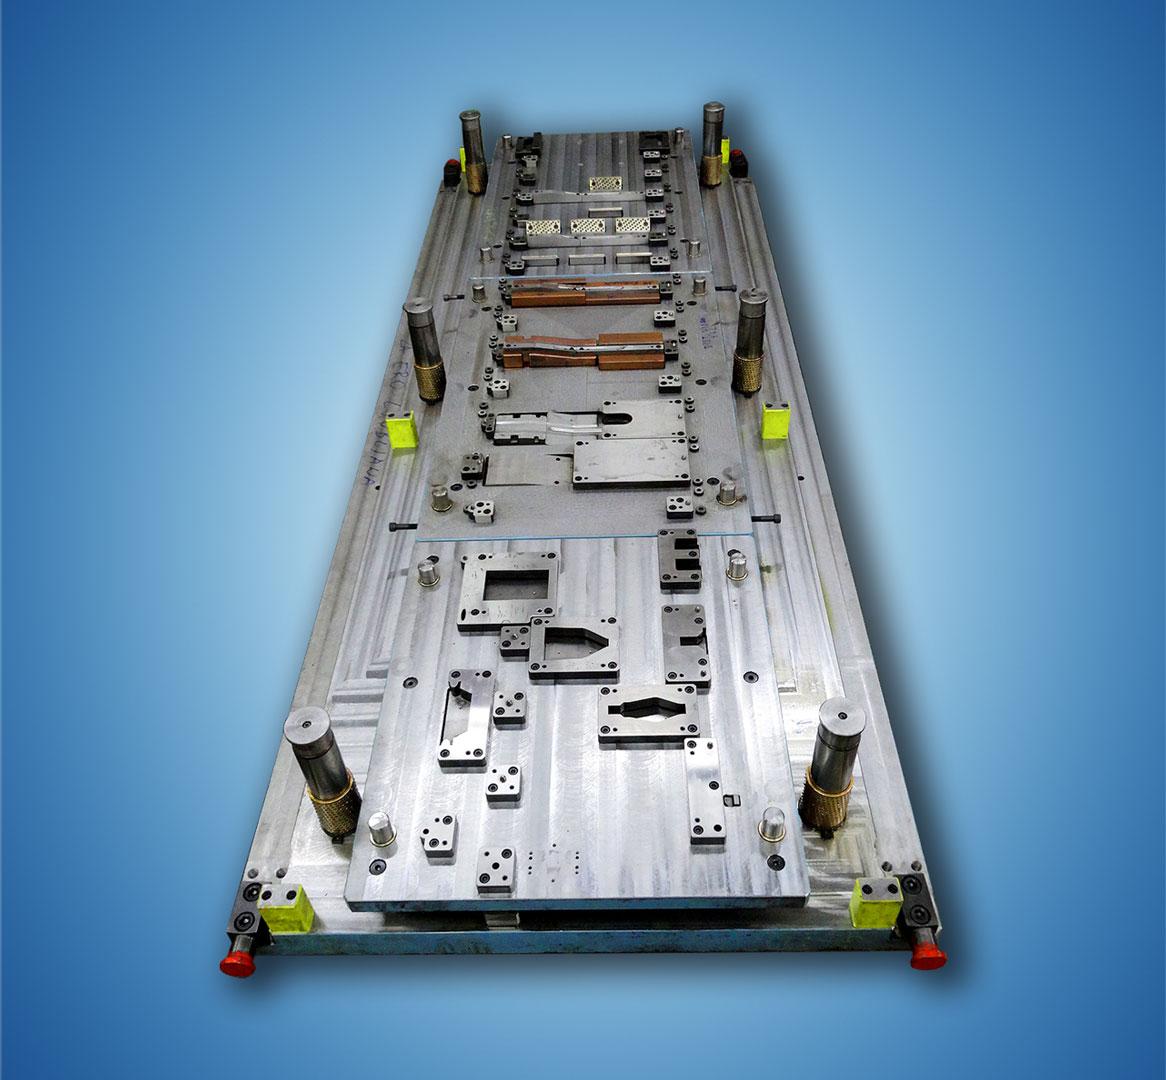 Ero-Projekt-d.o.o.-Toolshop-Werkzeugbau-5-Orodje-za-preoblikov--plocevine-_-slika-4